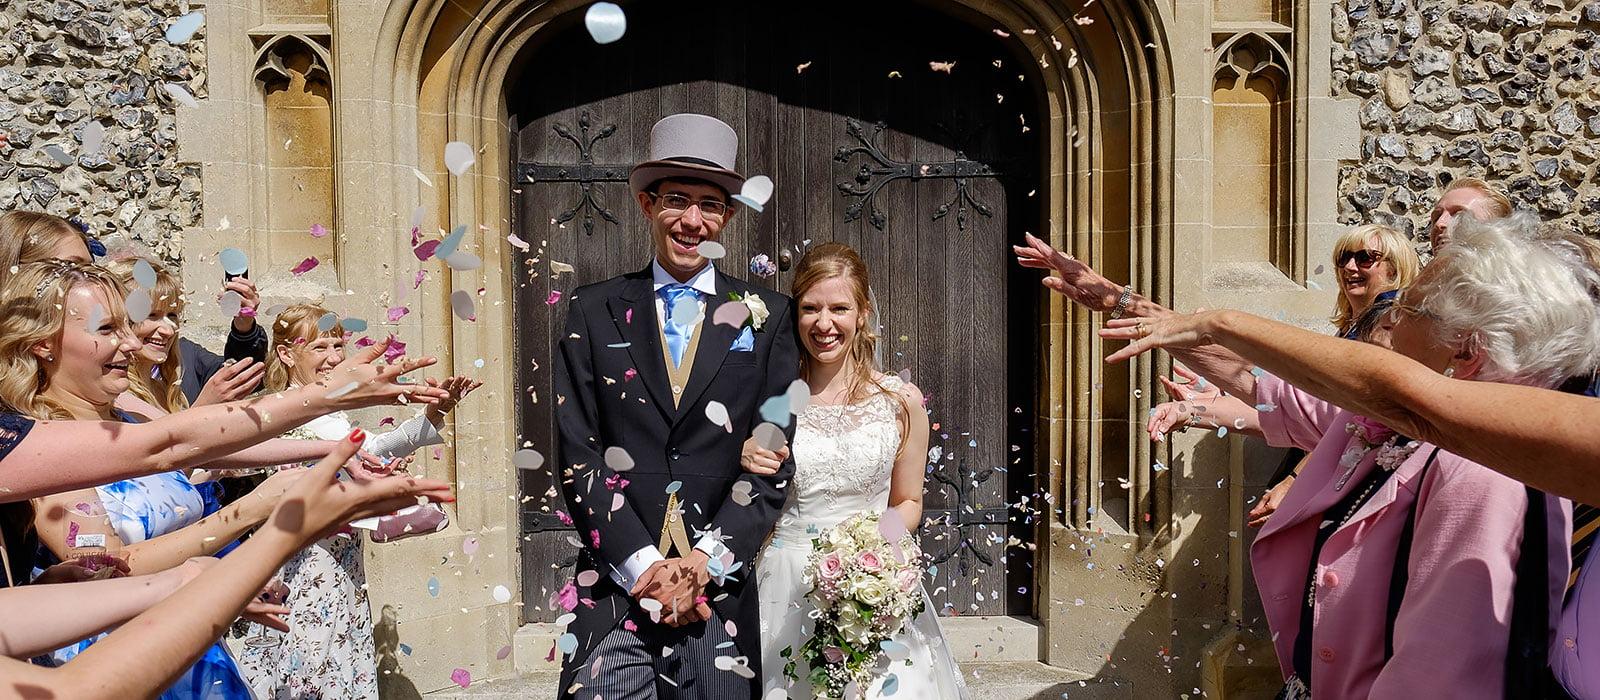 Leatherhead church wedding | Claire & Matthew